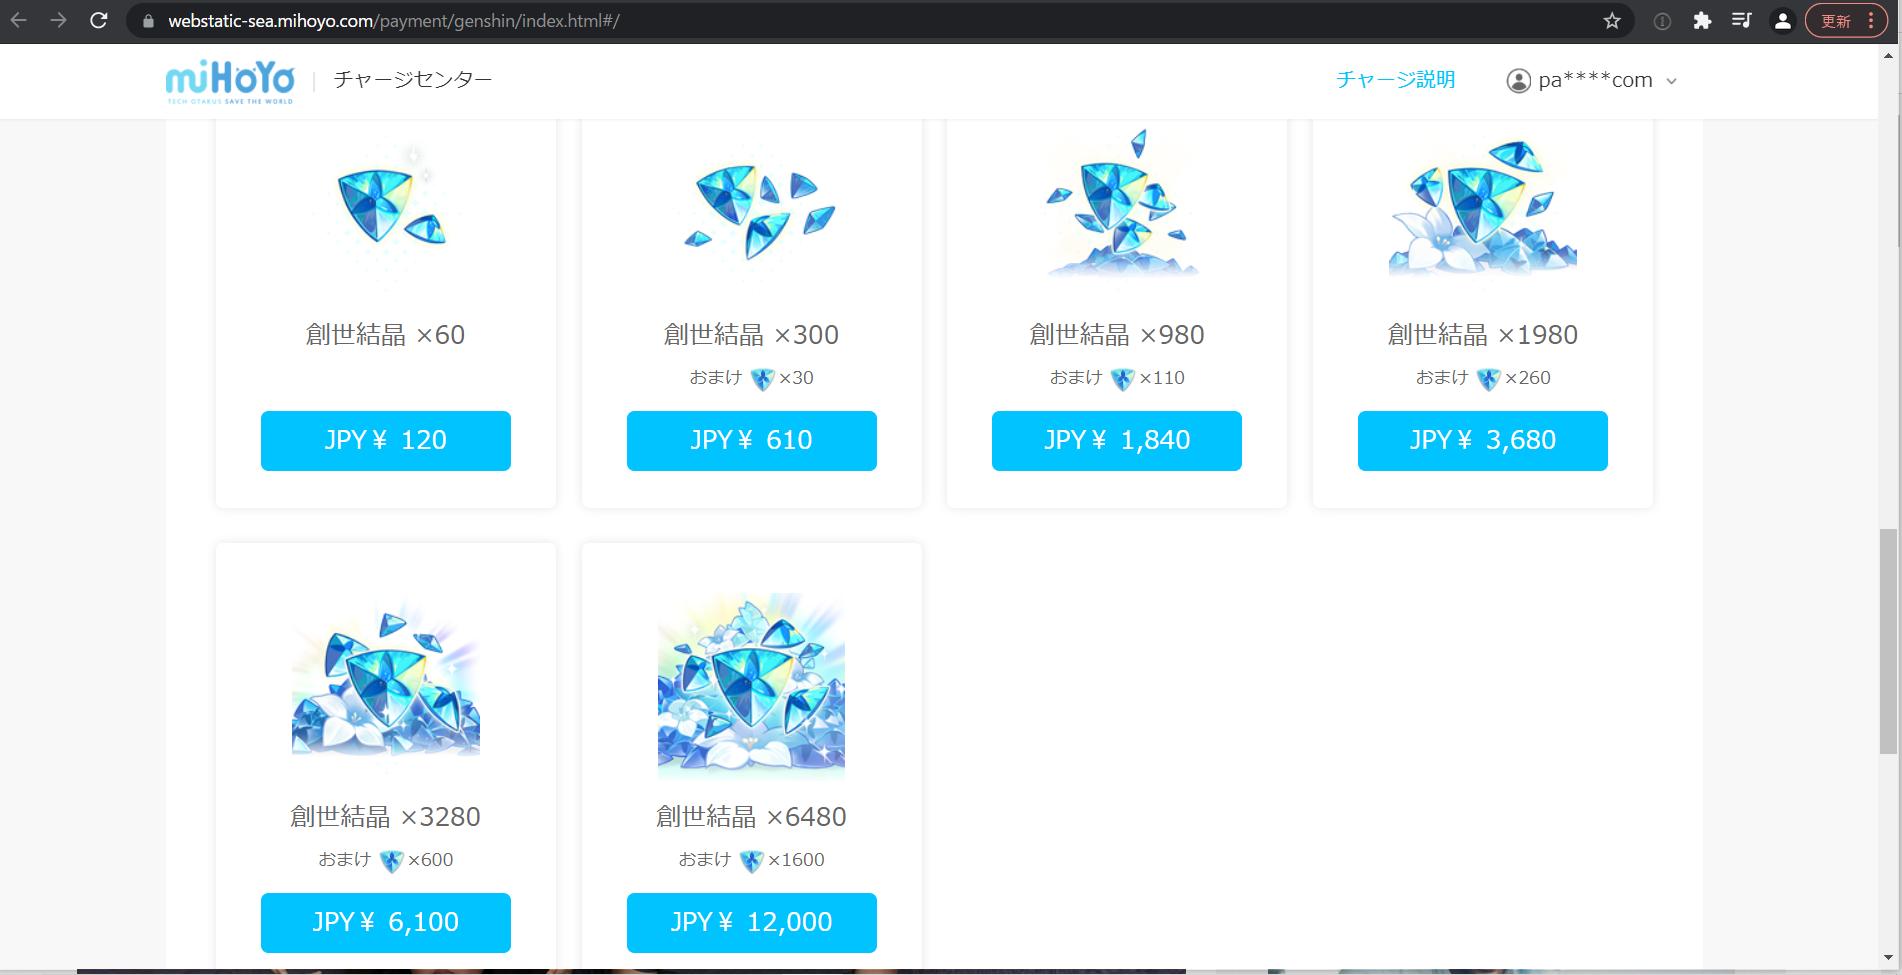 Genshin Impact website purchase screen